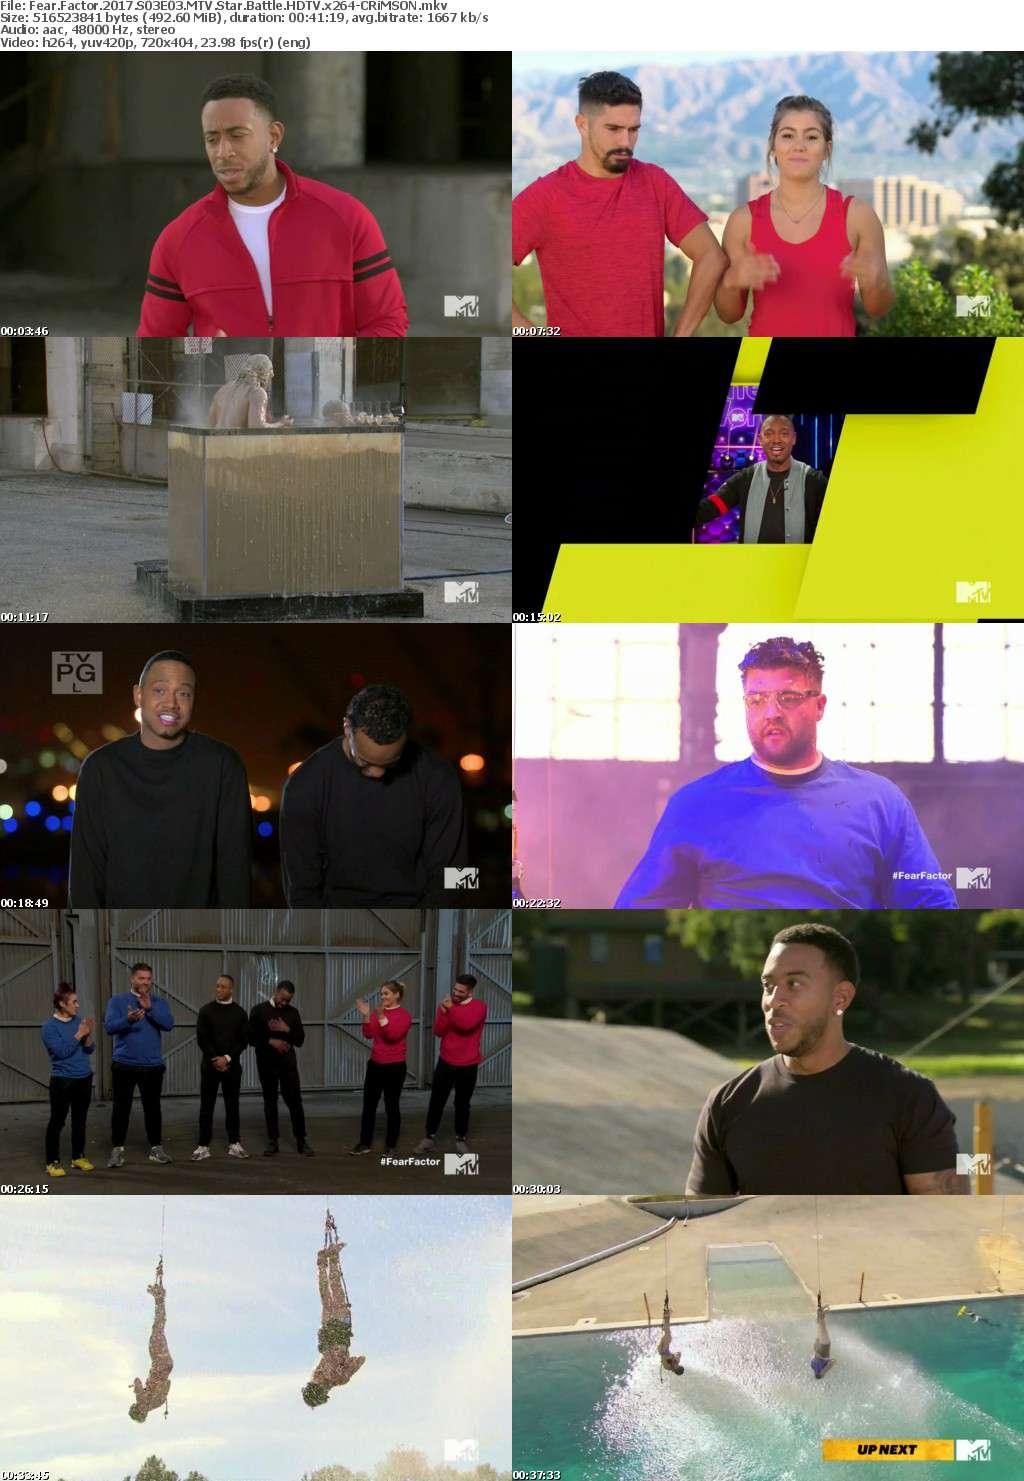 Fear Factor 2017 S03E03 MTV Star Battle HDTV x264-CRiMSON